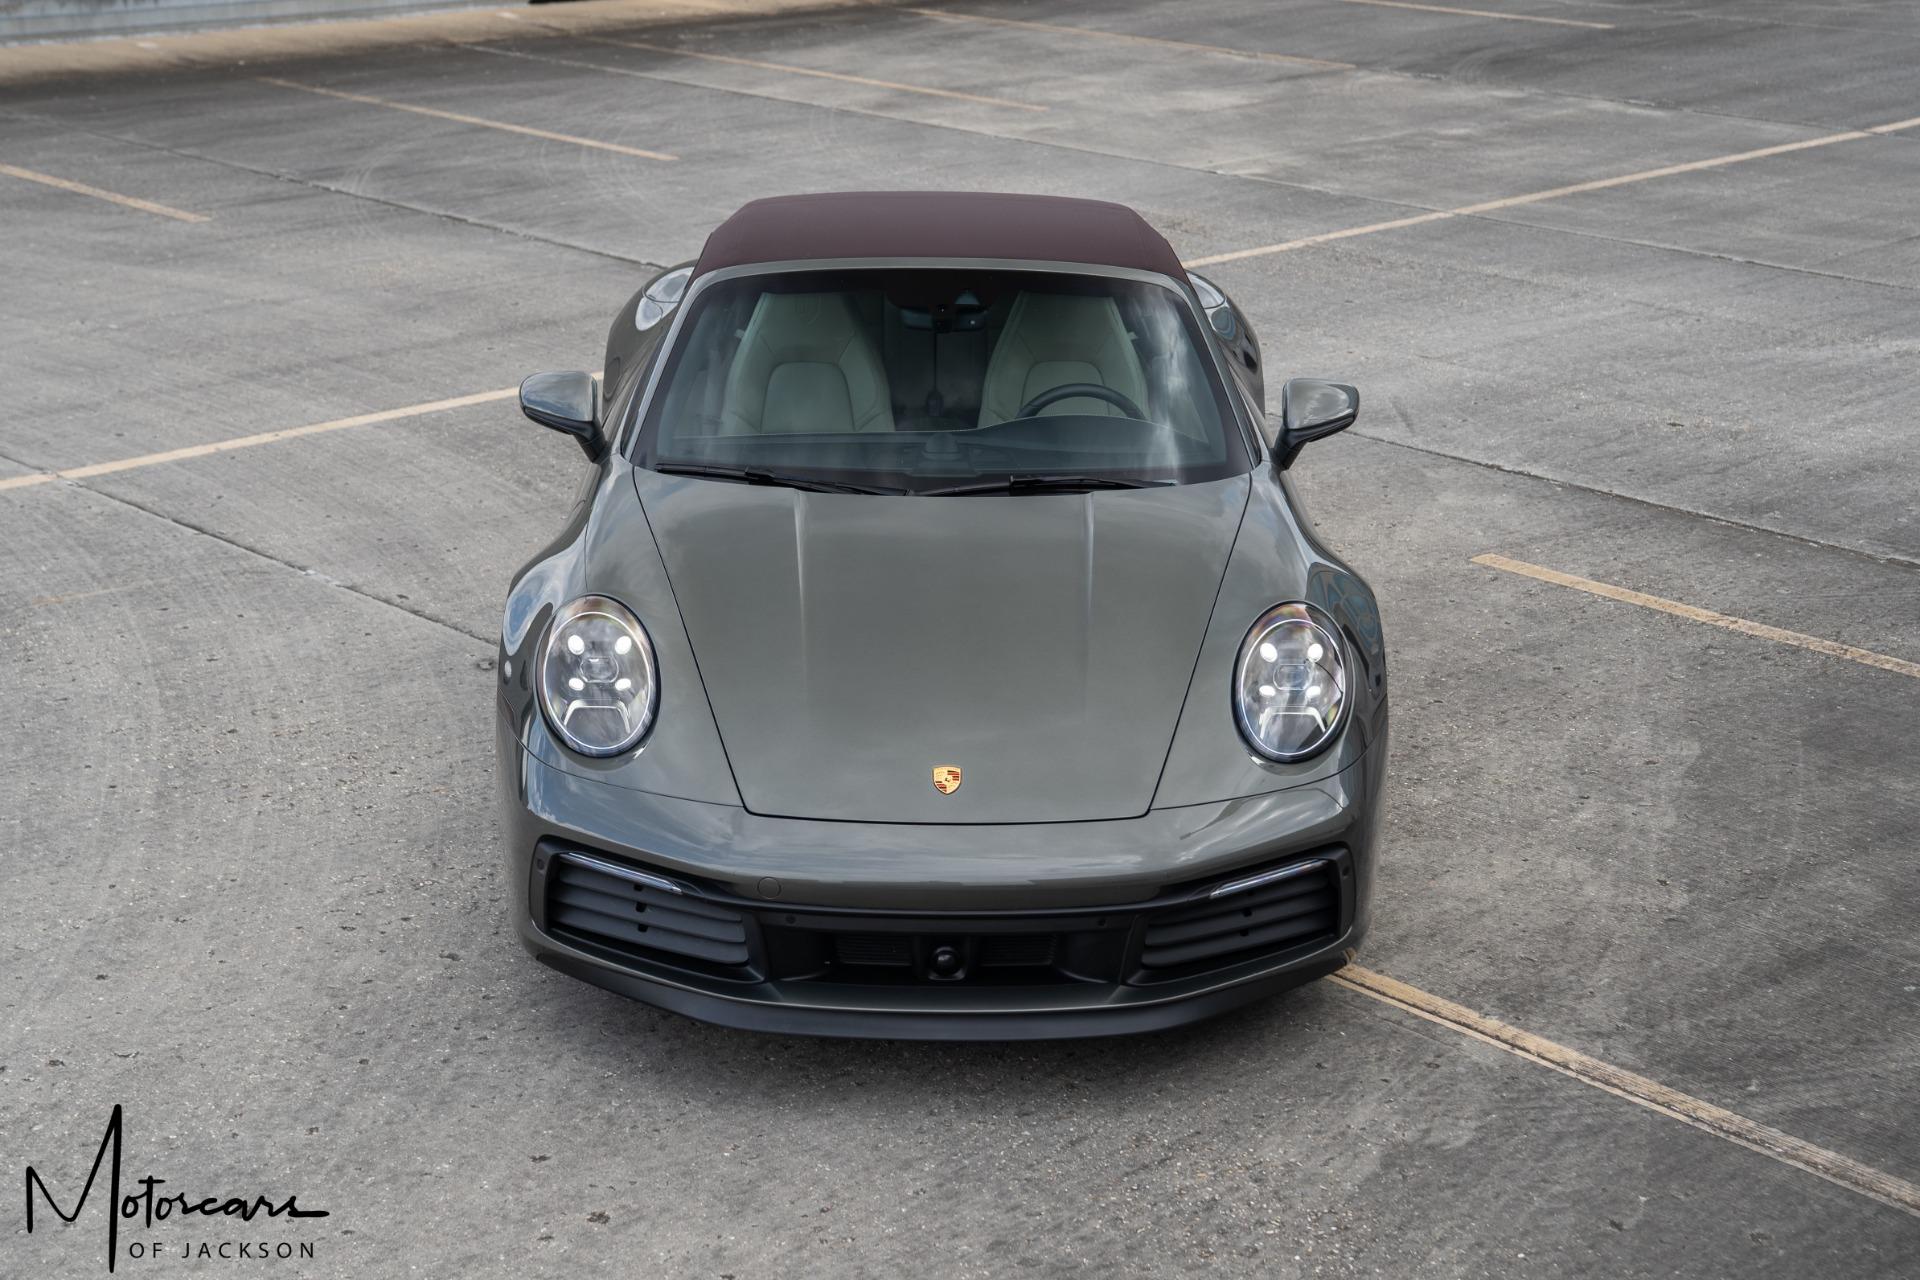 Used-2020-Porsche-911-Carrera-S-Cabriolet-for-sale-Jackson-MS